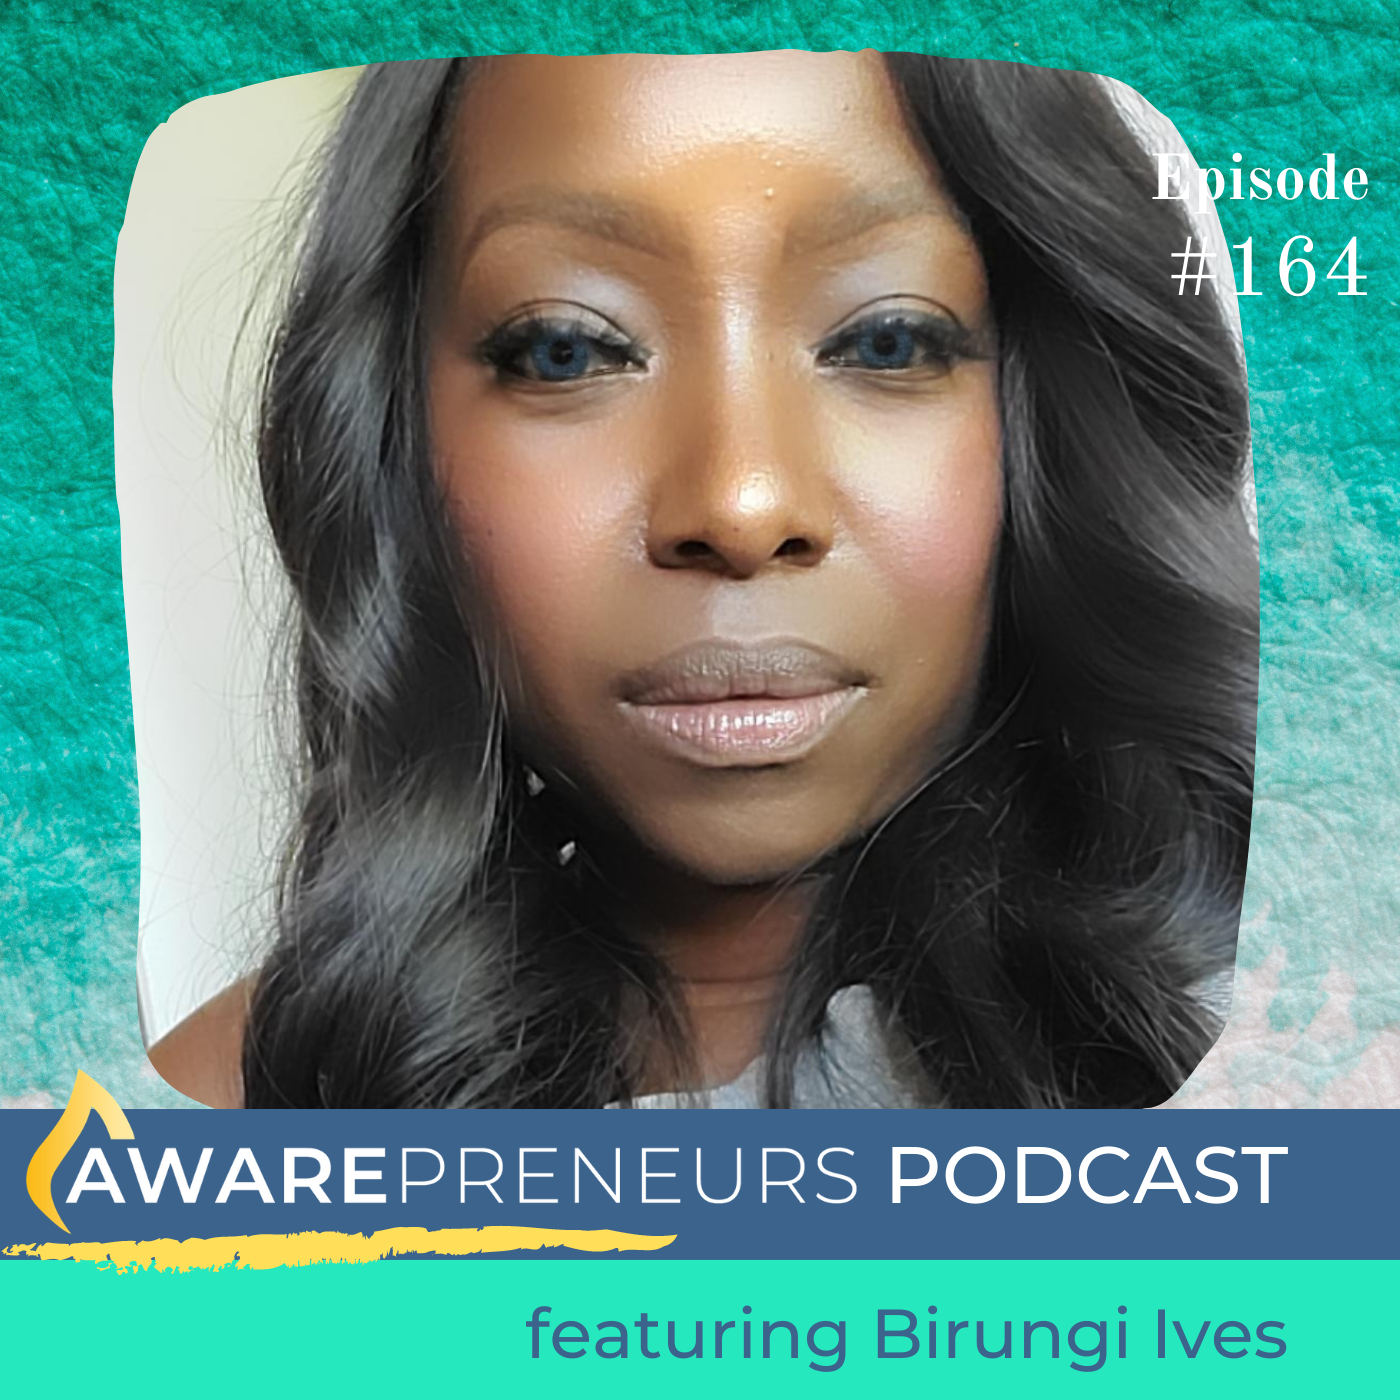 Awarepreneurs Podcaset featuring Birungi Ives